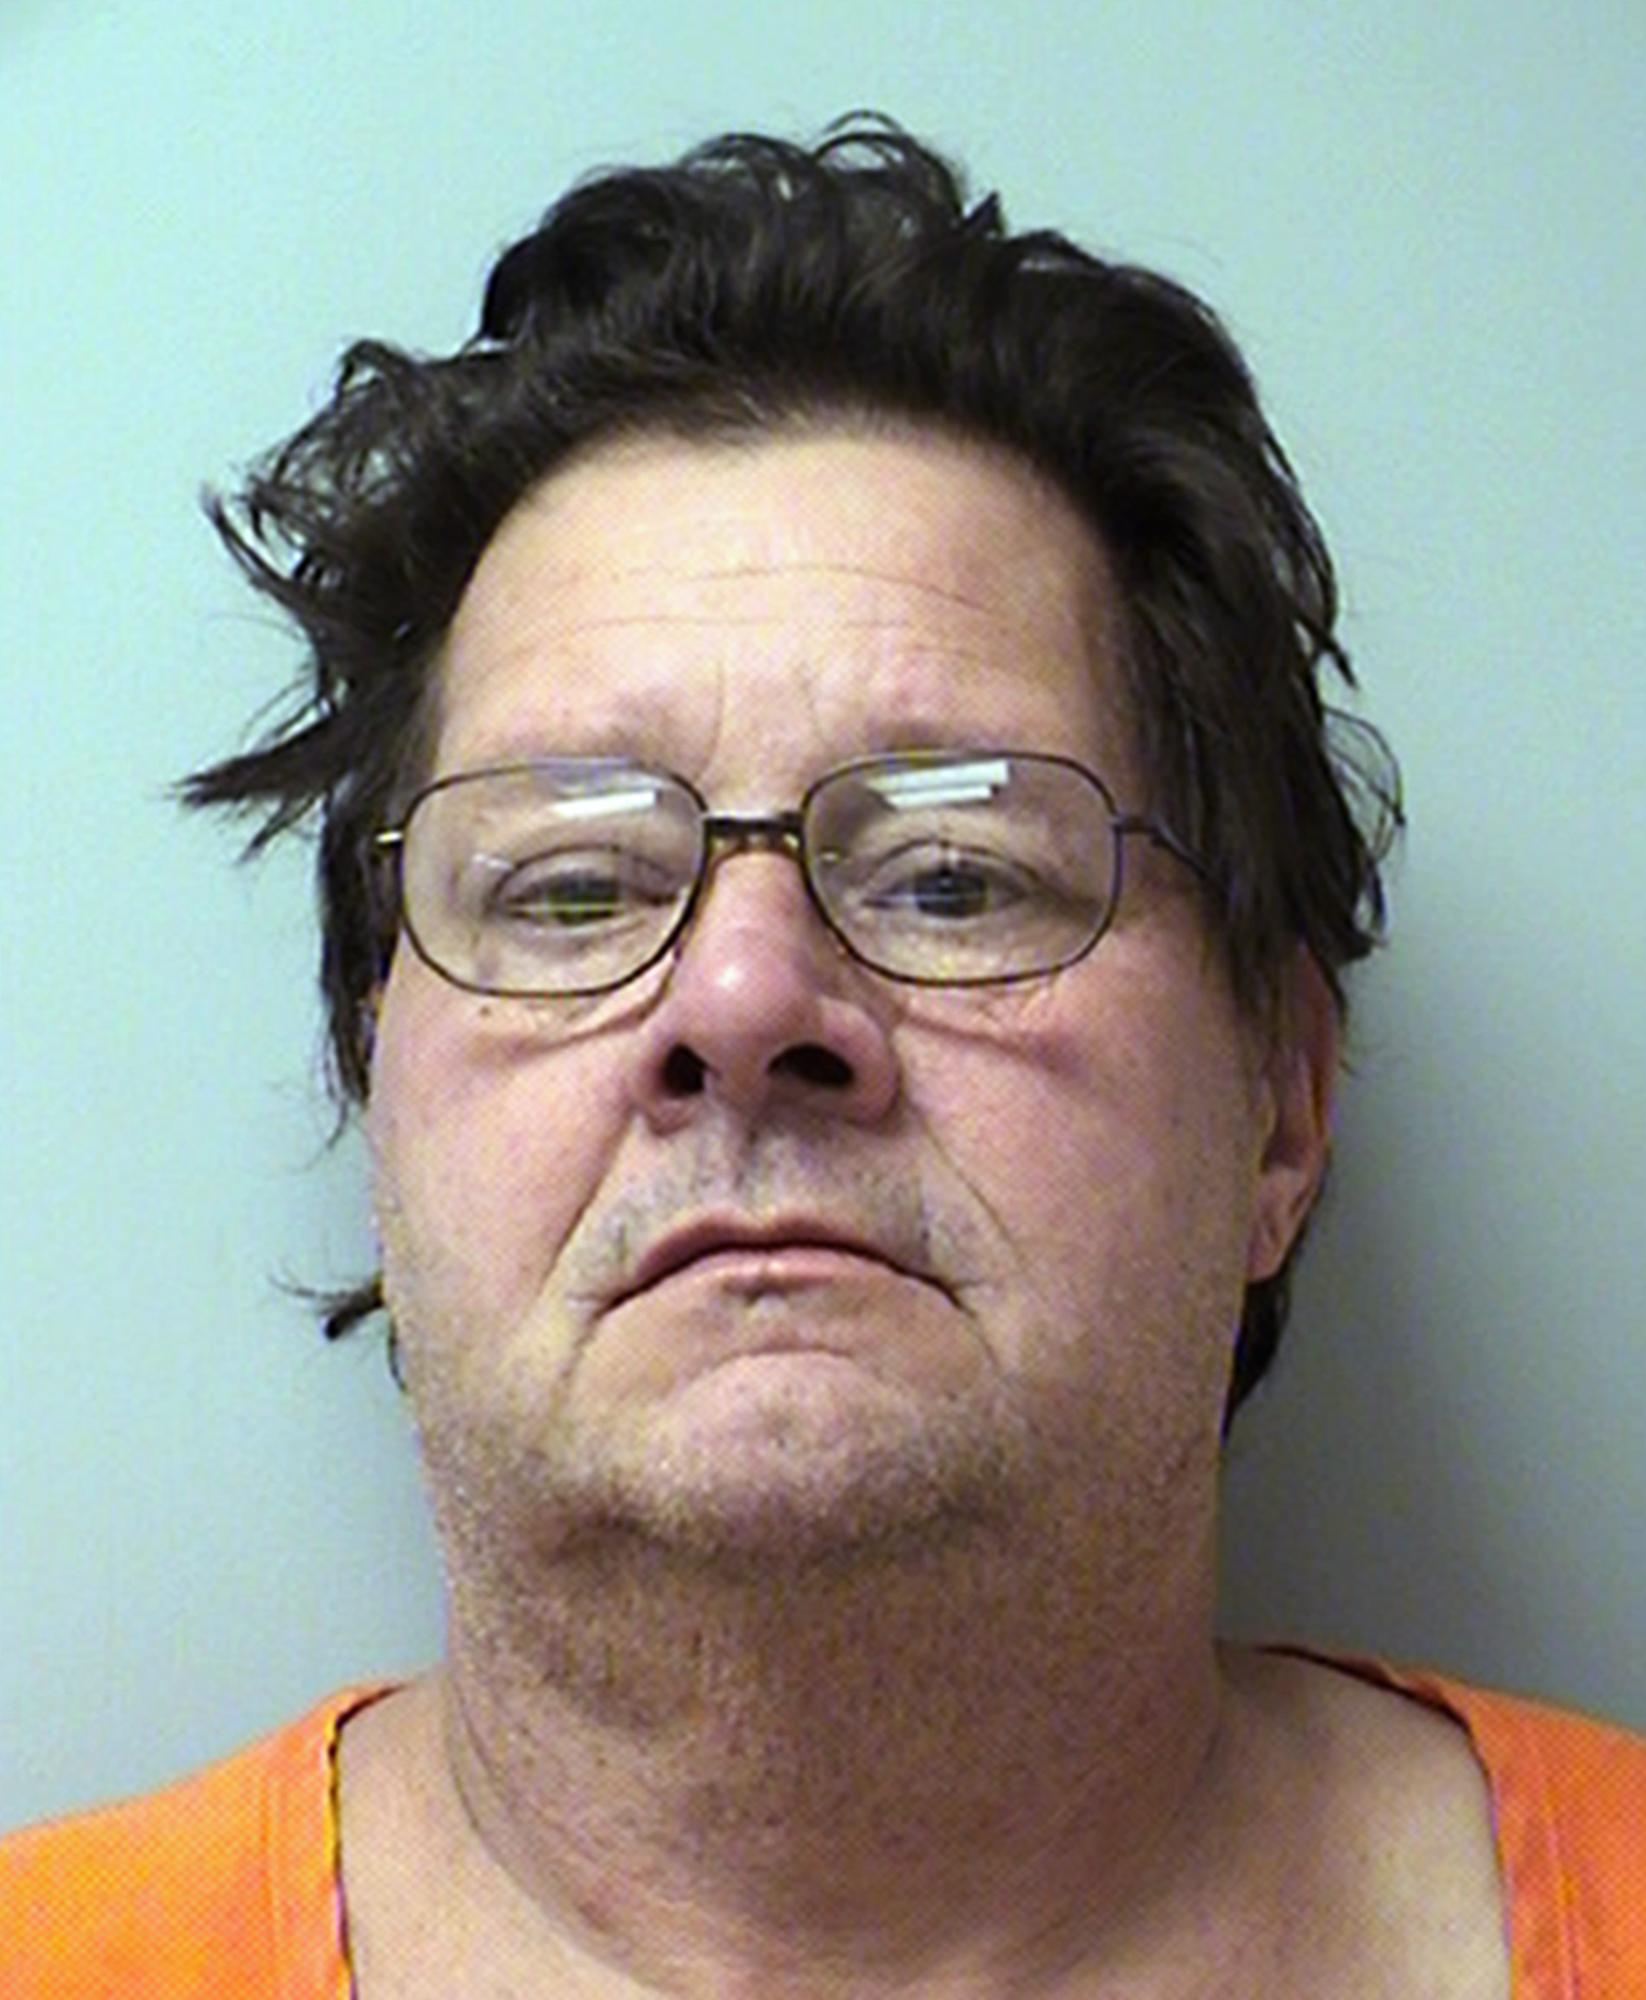 Allen Jamroz, of Mosinee, Wis. (Marathon County Sheriff's Department via AP)